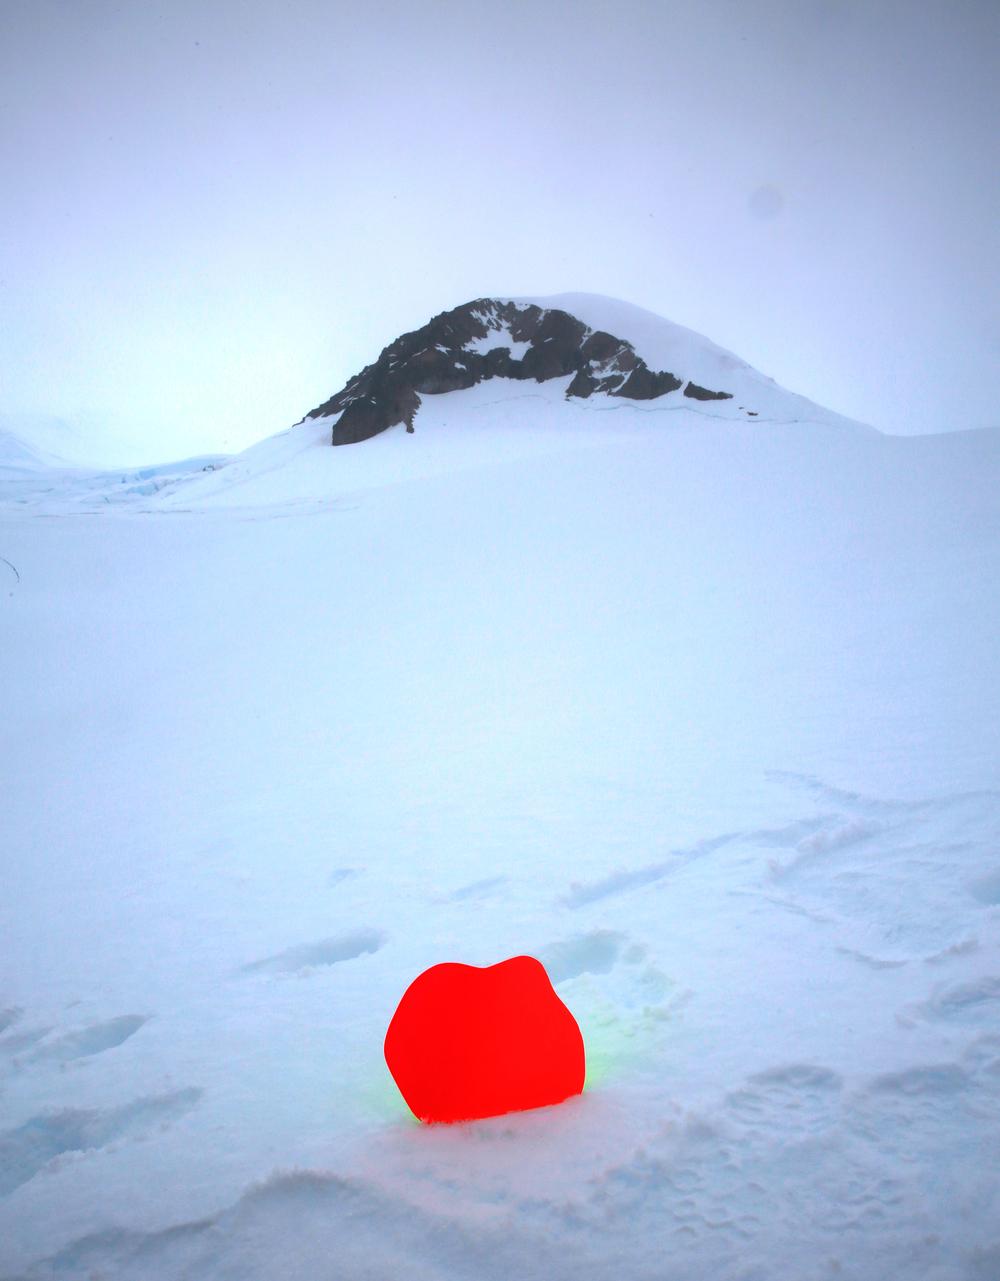 Antartic Series , Fiberglass, Epoxy Resin, Enamel, 2015 @Devra Freelander